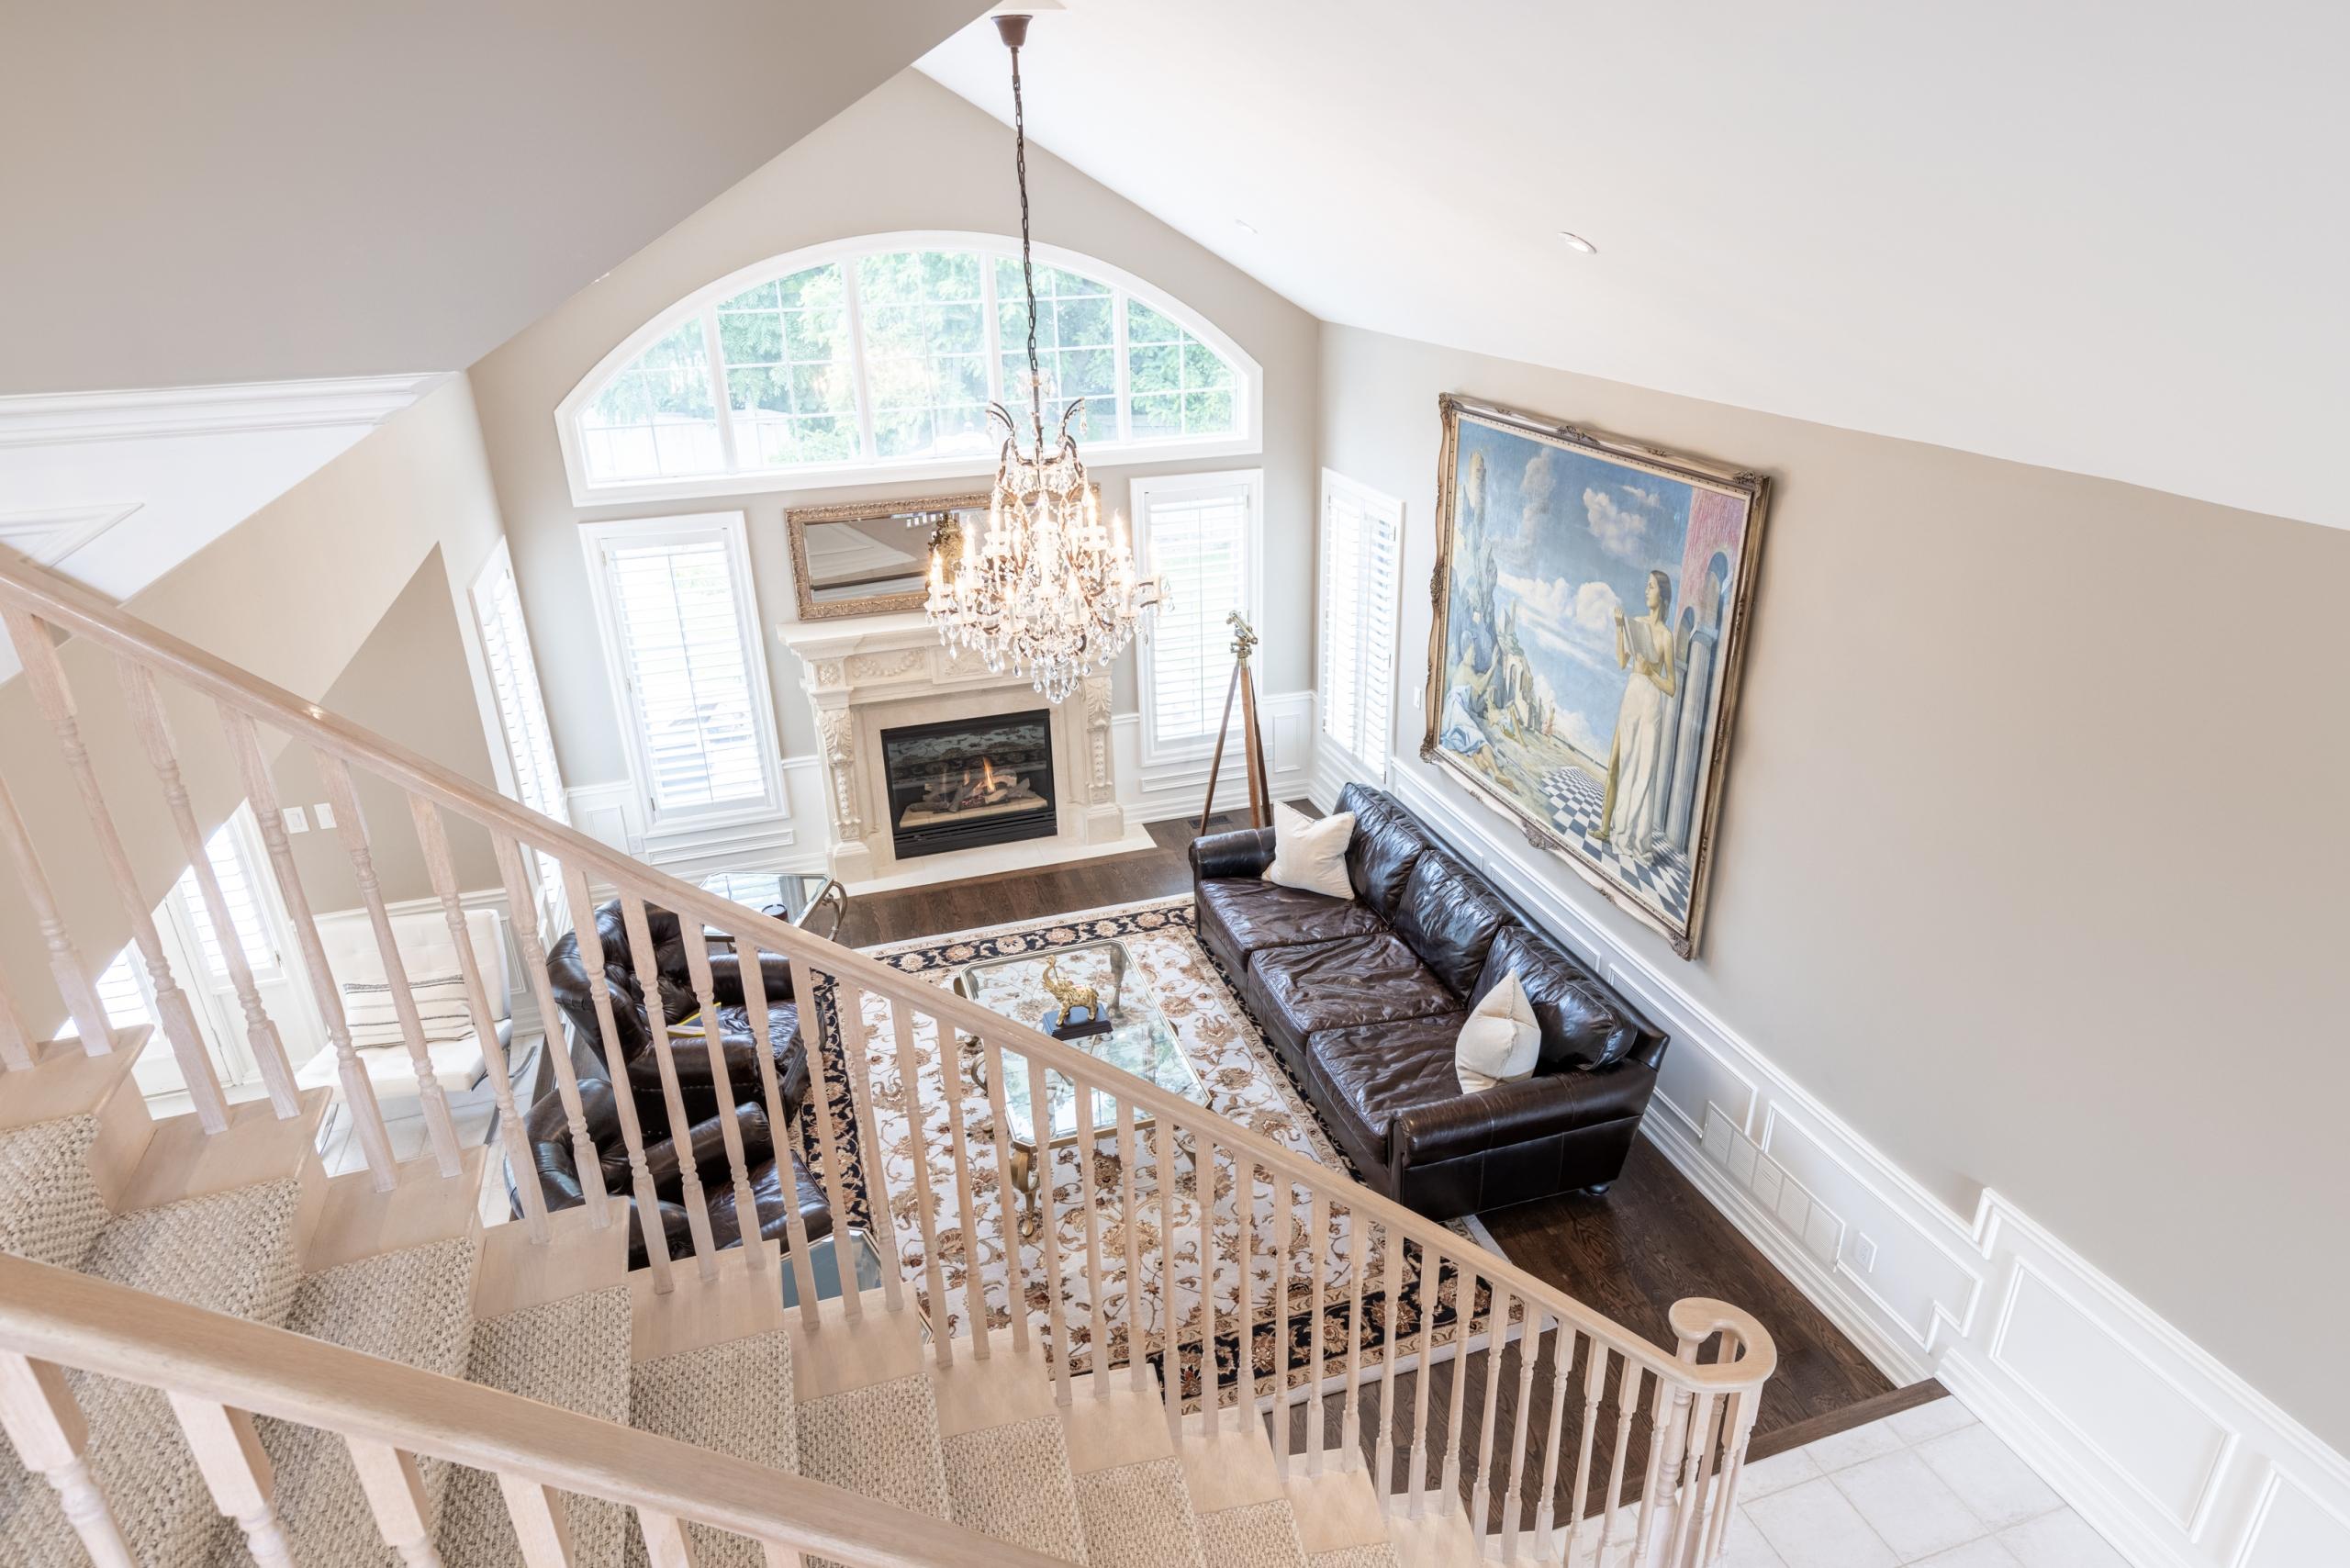 Living room featured at 956 Halsham Court, Mississauga at Alex Irish & Associates